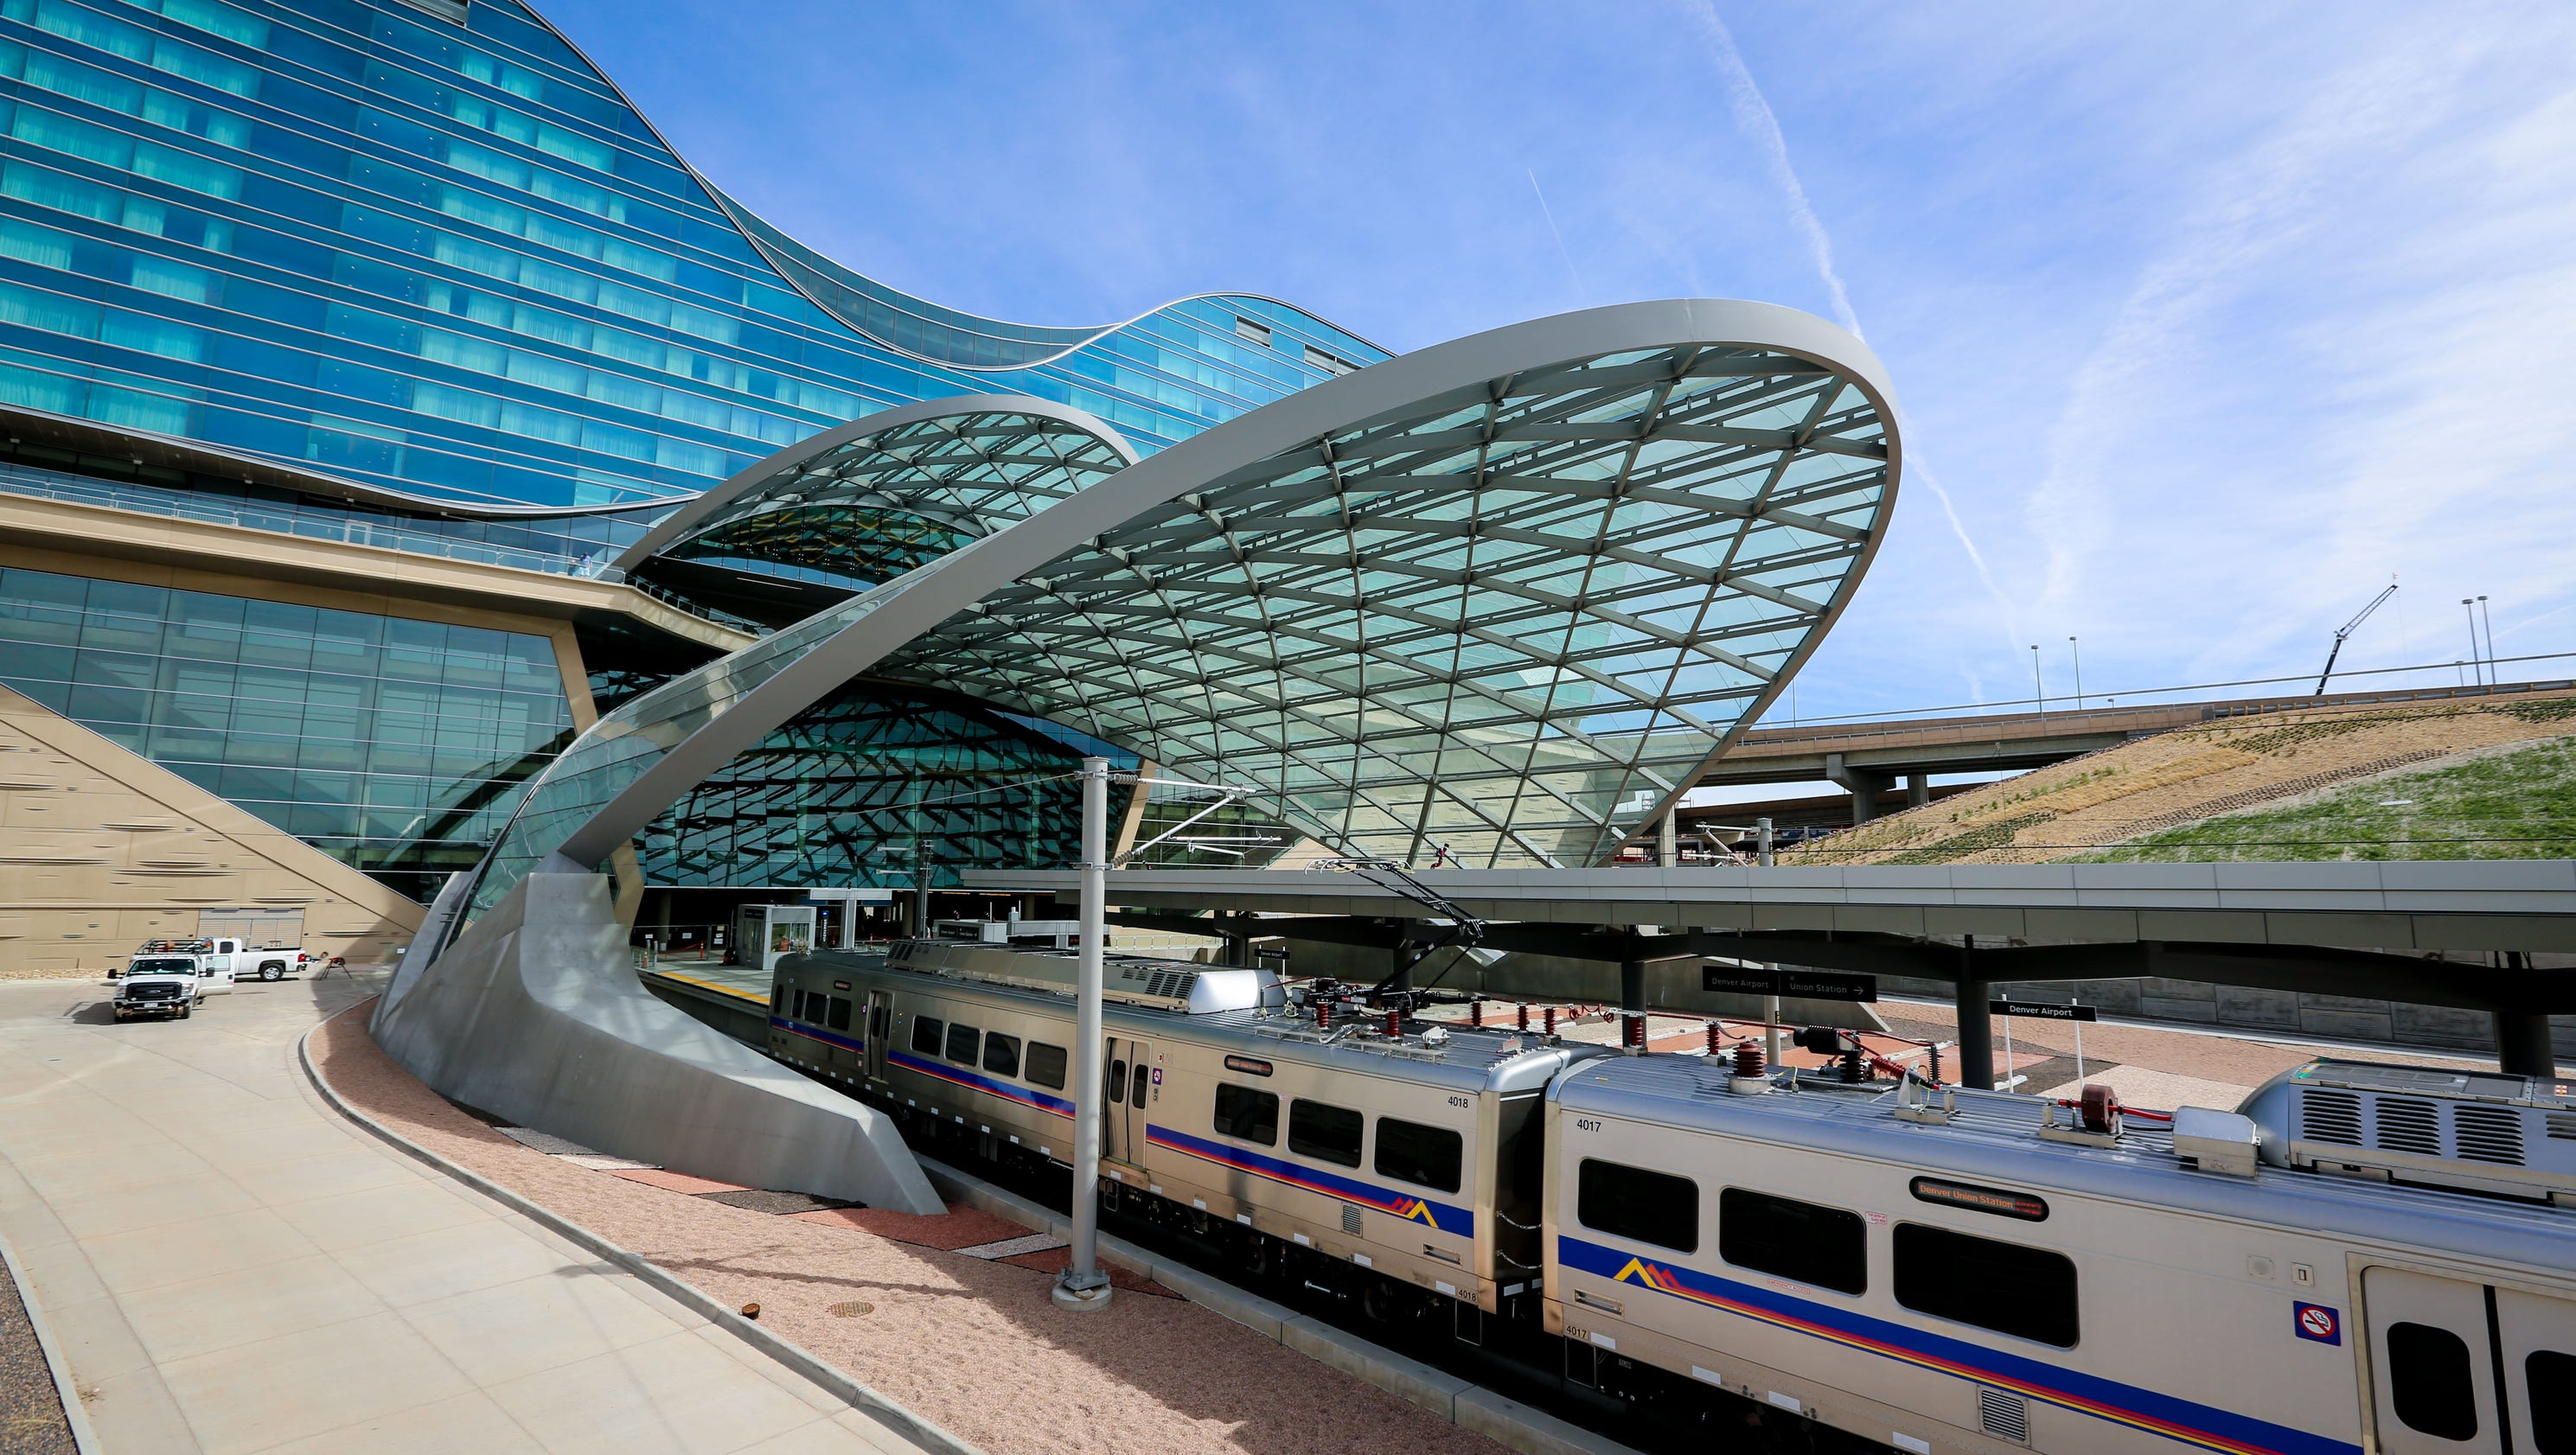 Denver S New Airport Train Starts Service